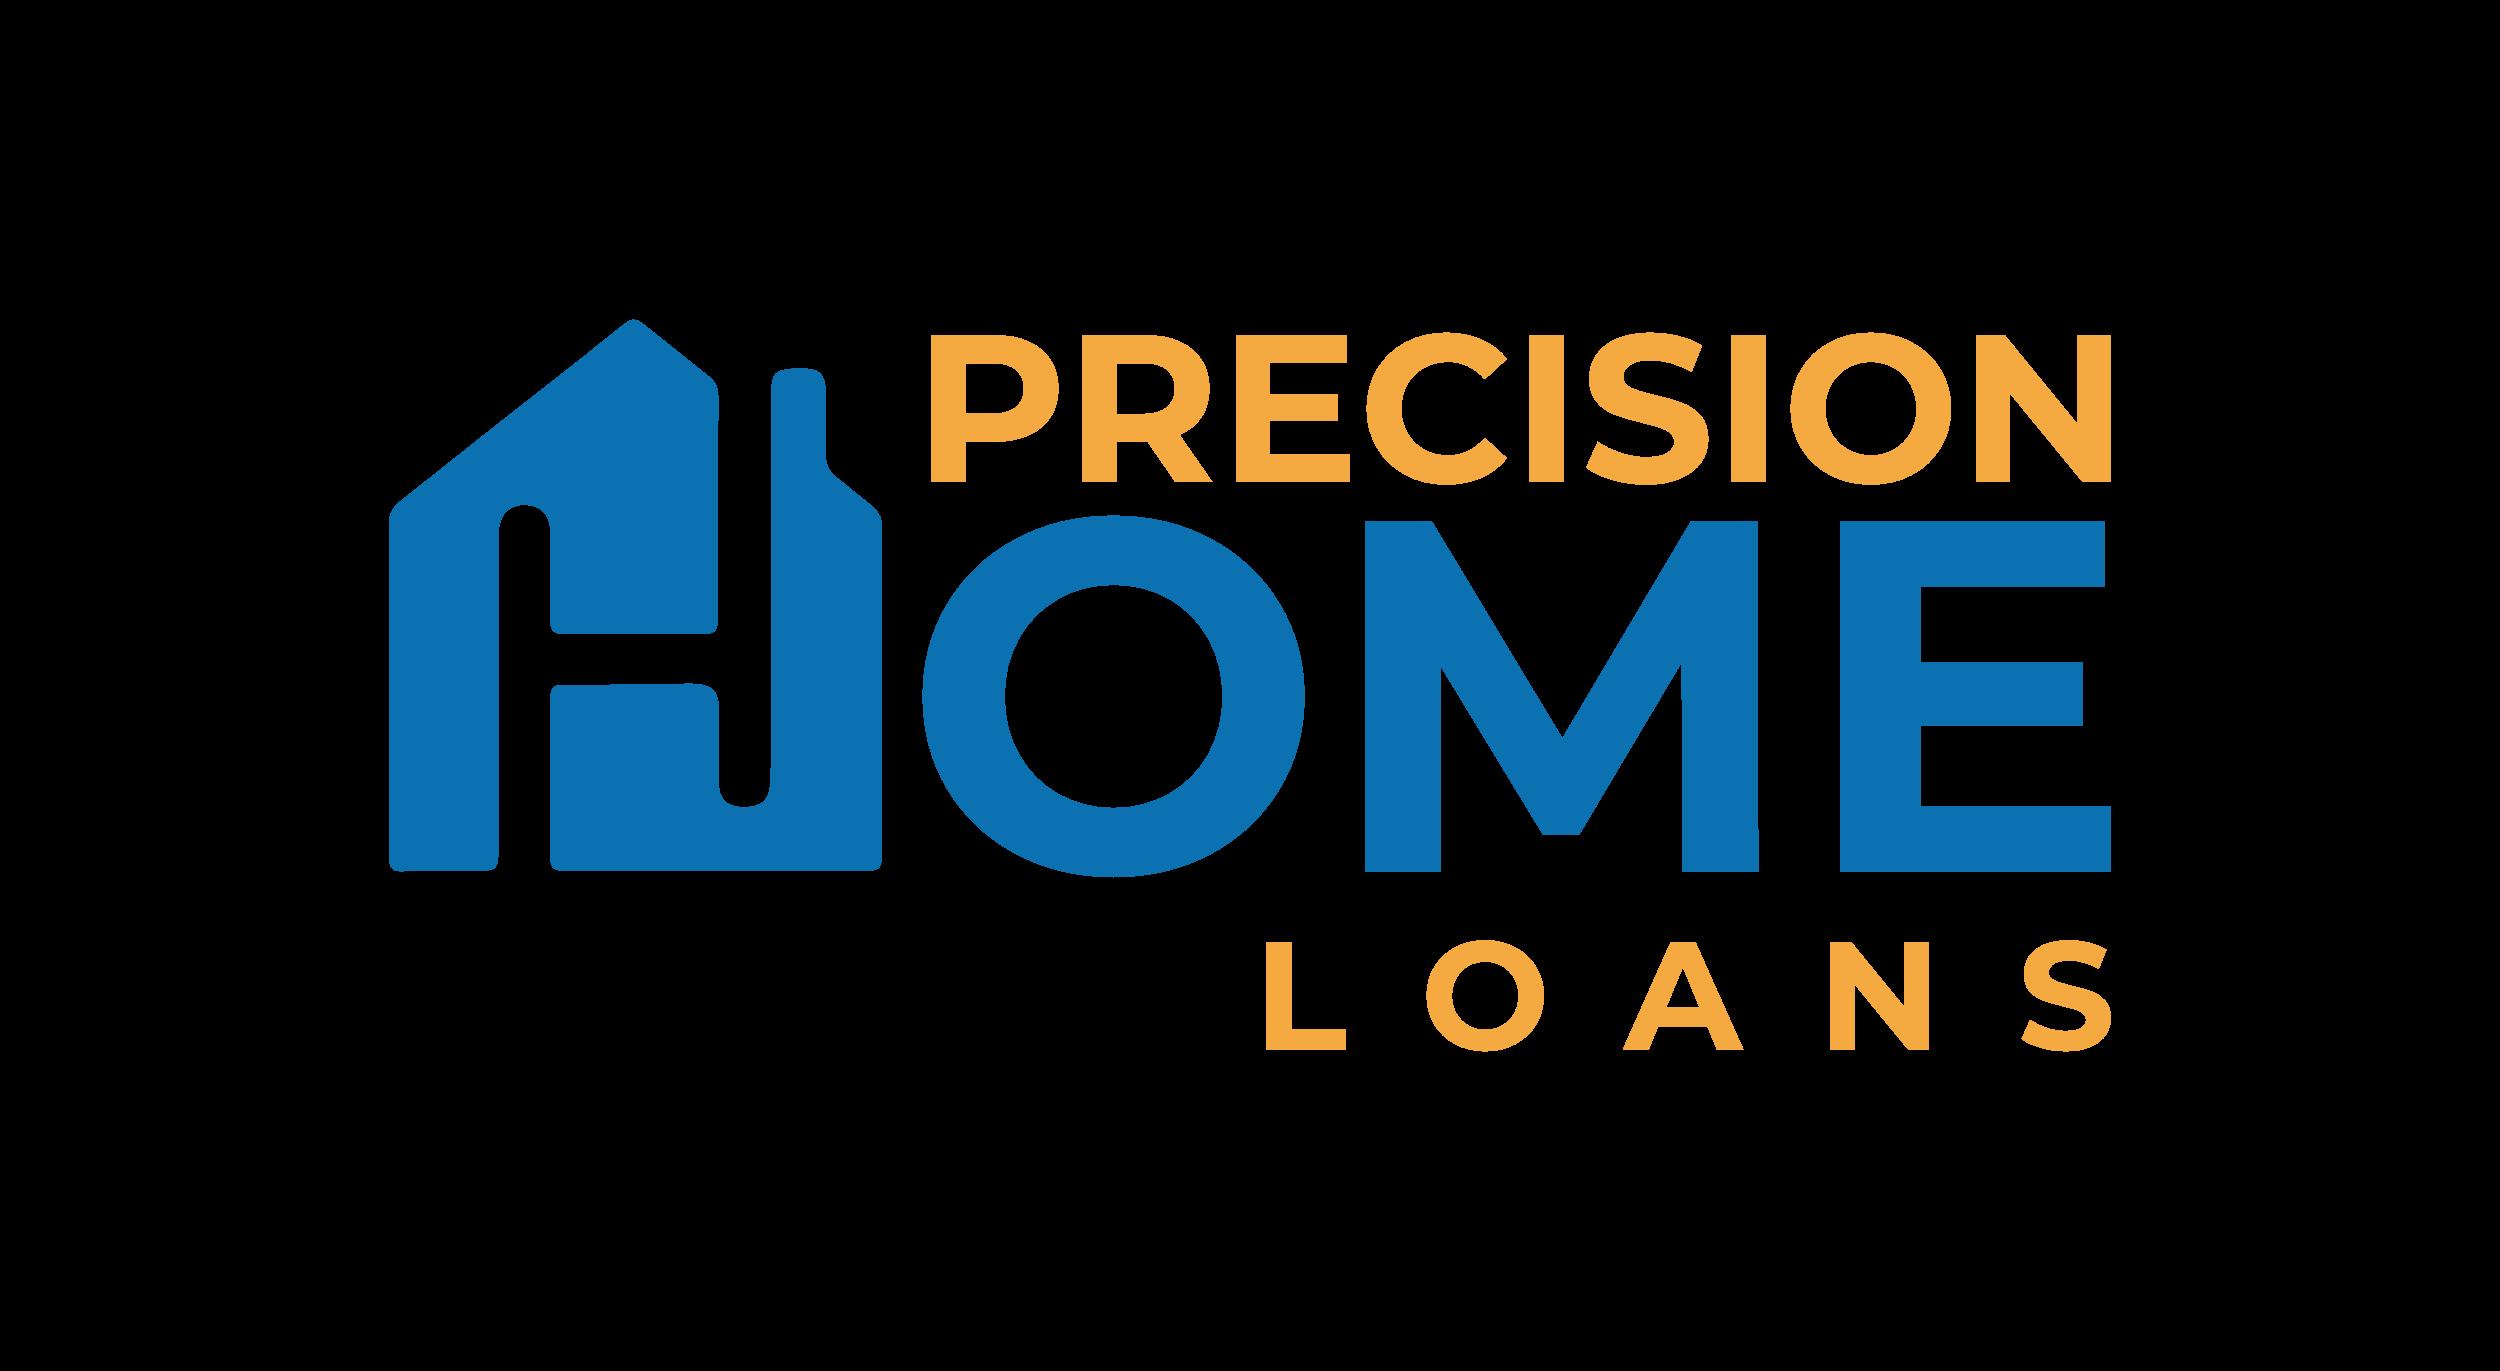 Precision Home Loans